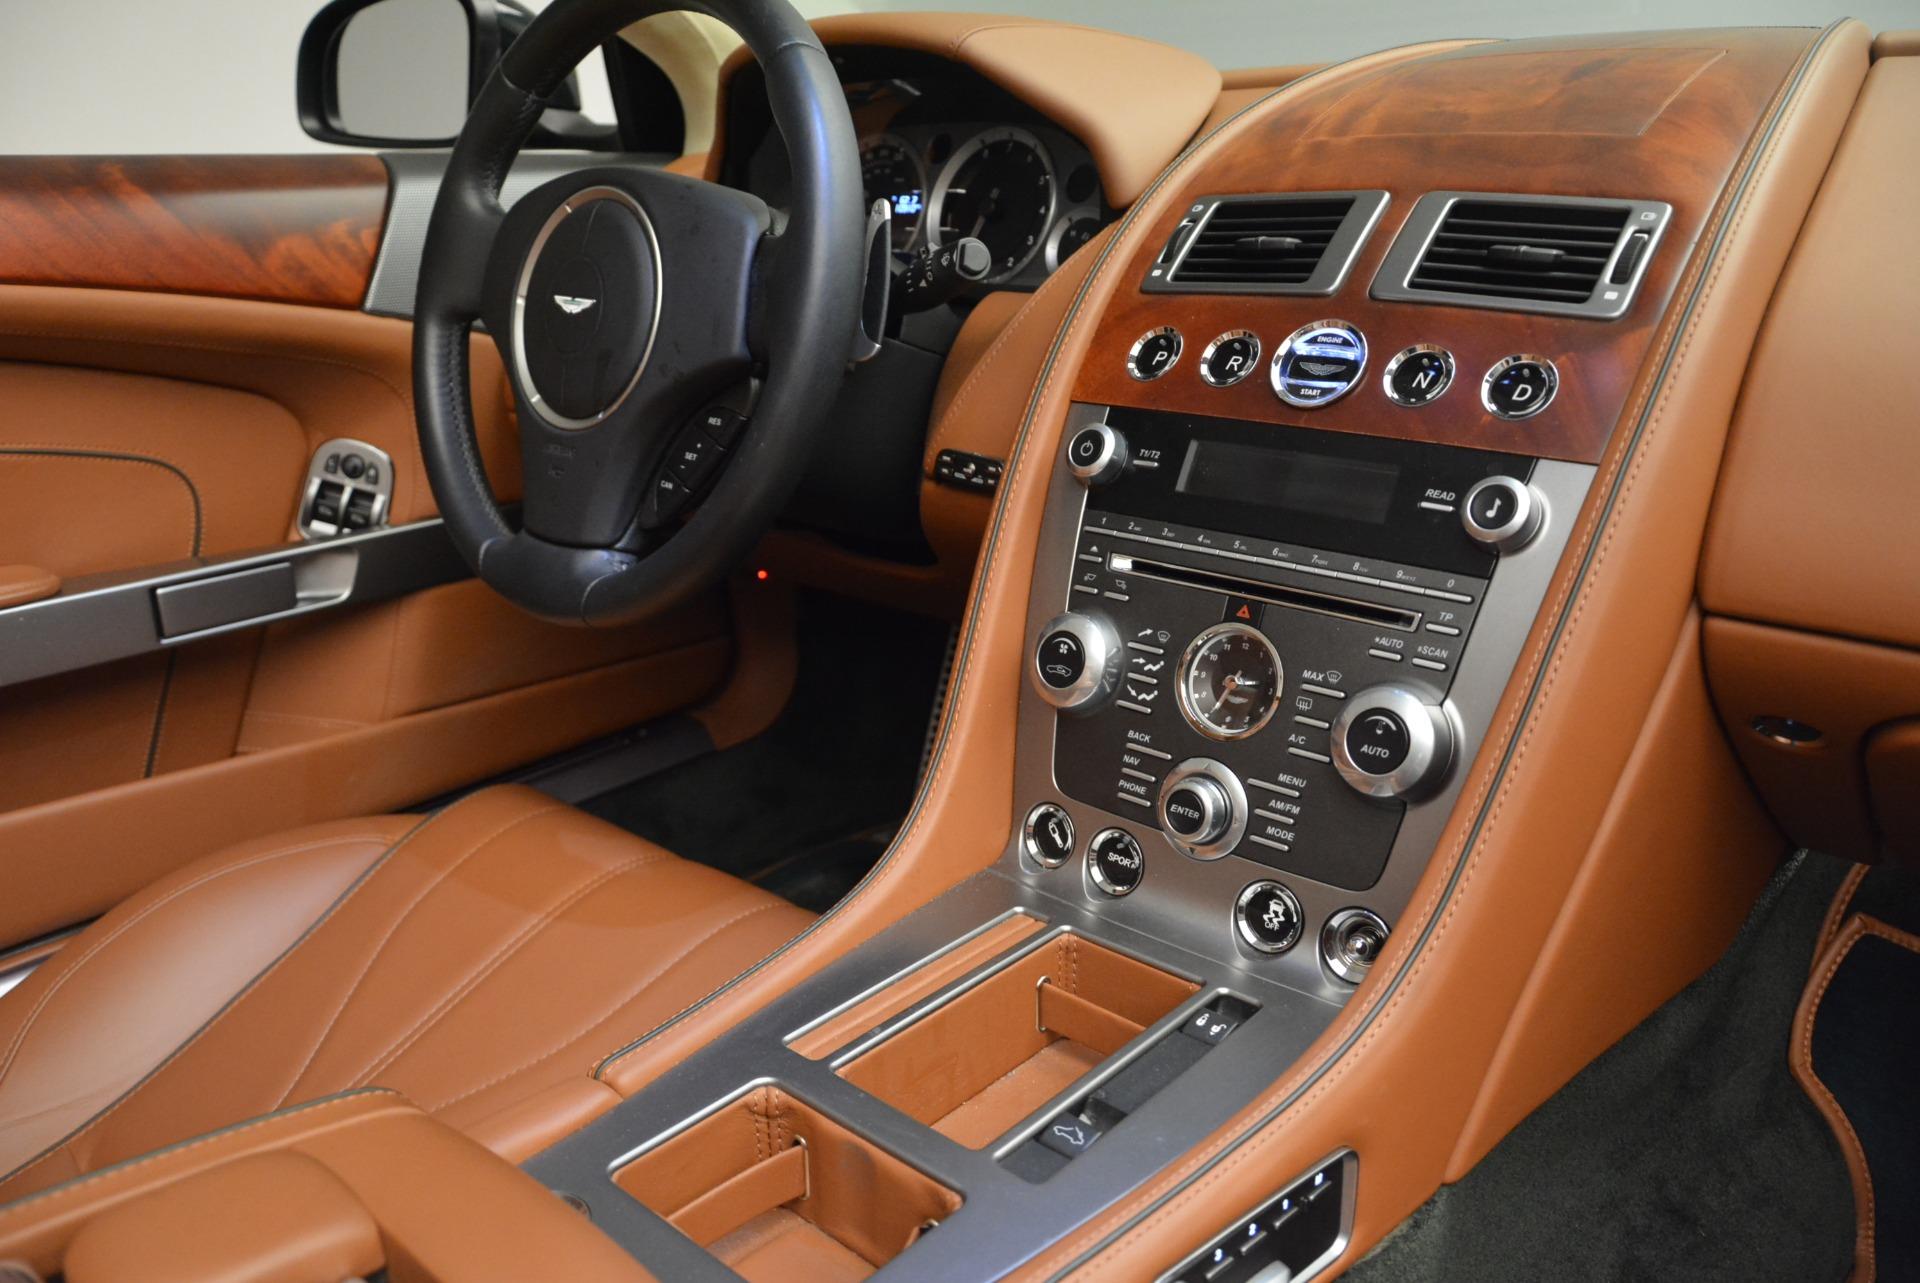 Used 2012 Aston Martin Virage Volante For Sale In Westport, CT 2508_p24